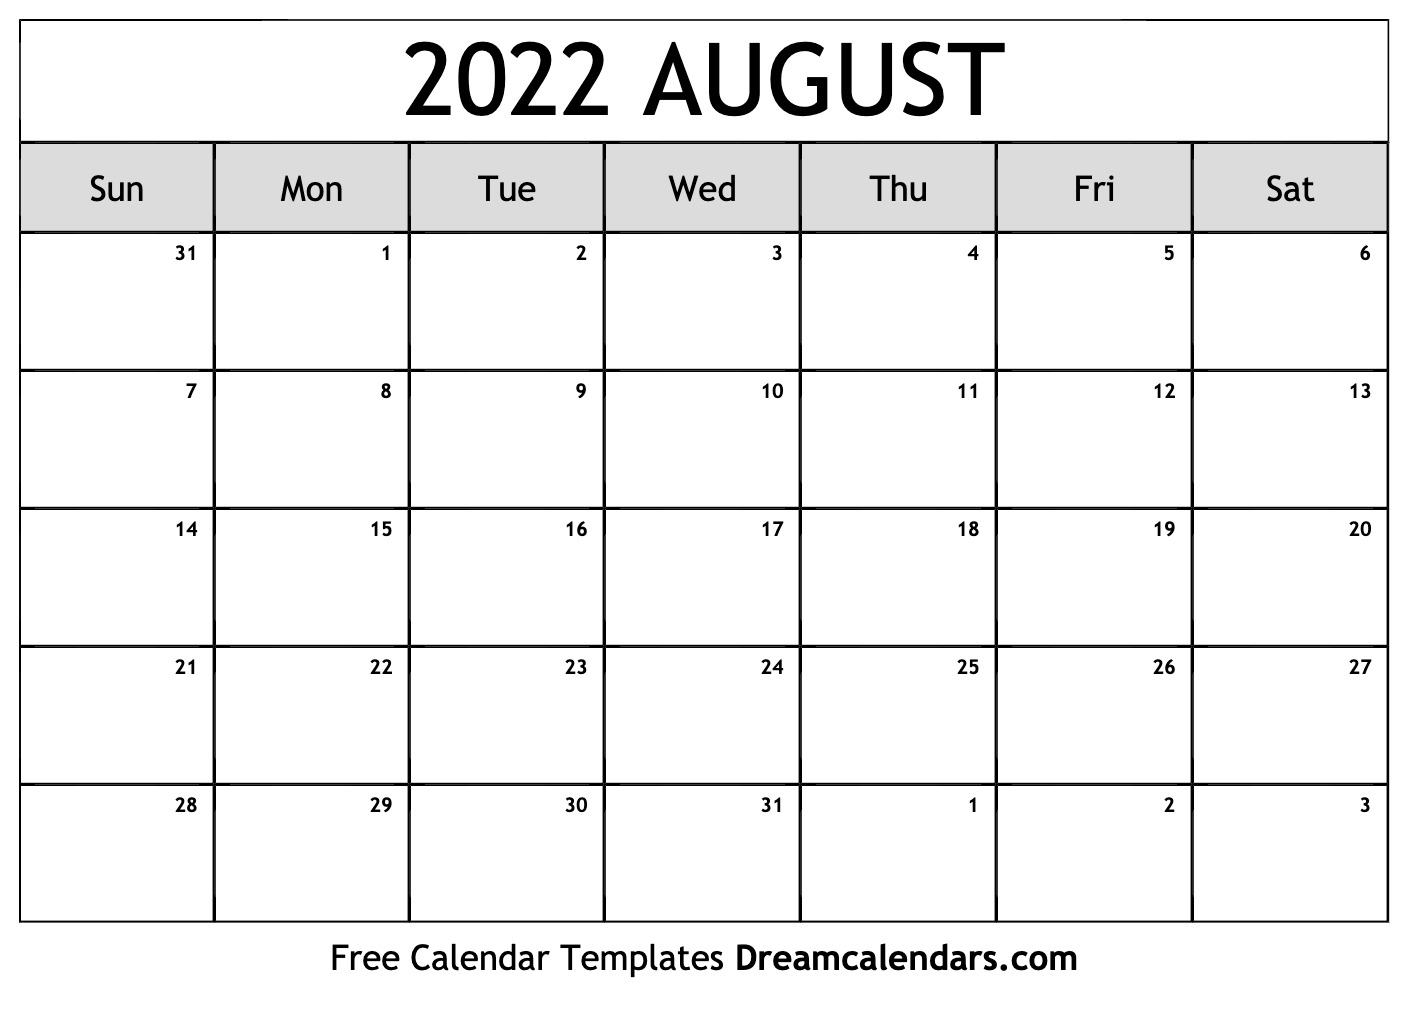 August Printable Calendar 2022.August 2022 Calendar Free Blank Printable Templates